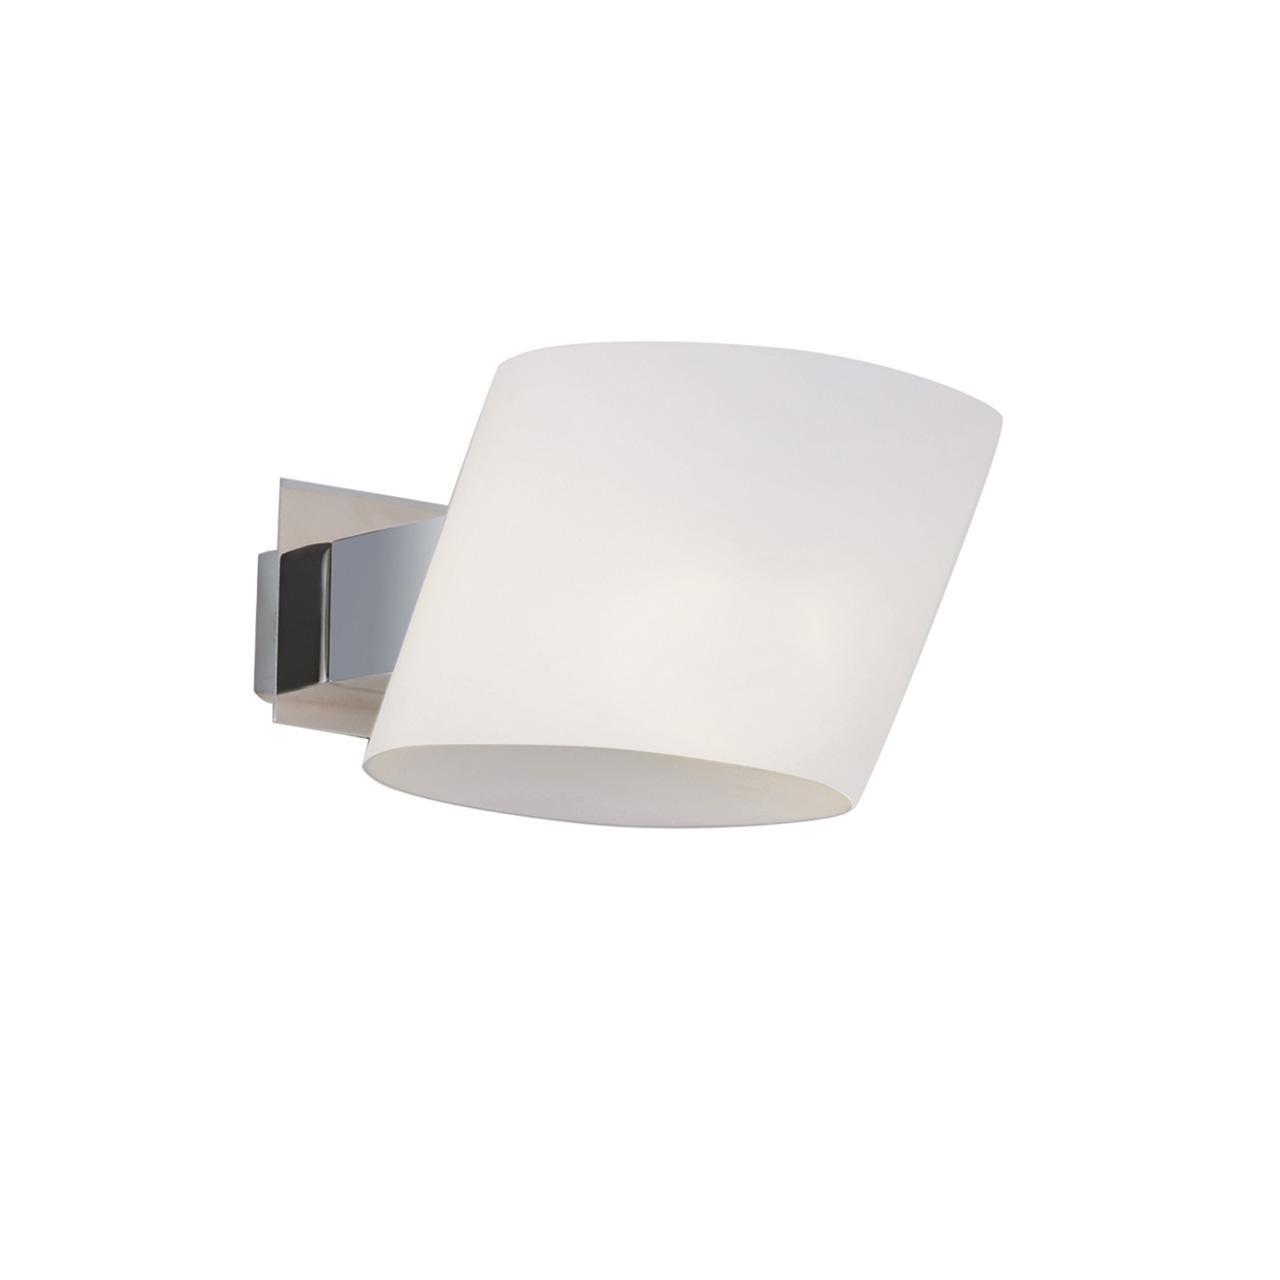 Бра Lightstar Dissimo 803610 бра lightstar simple light g9 40w ls 803610